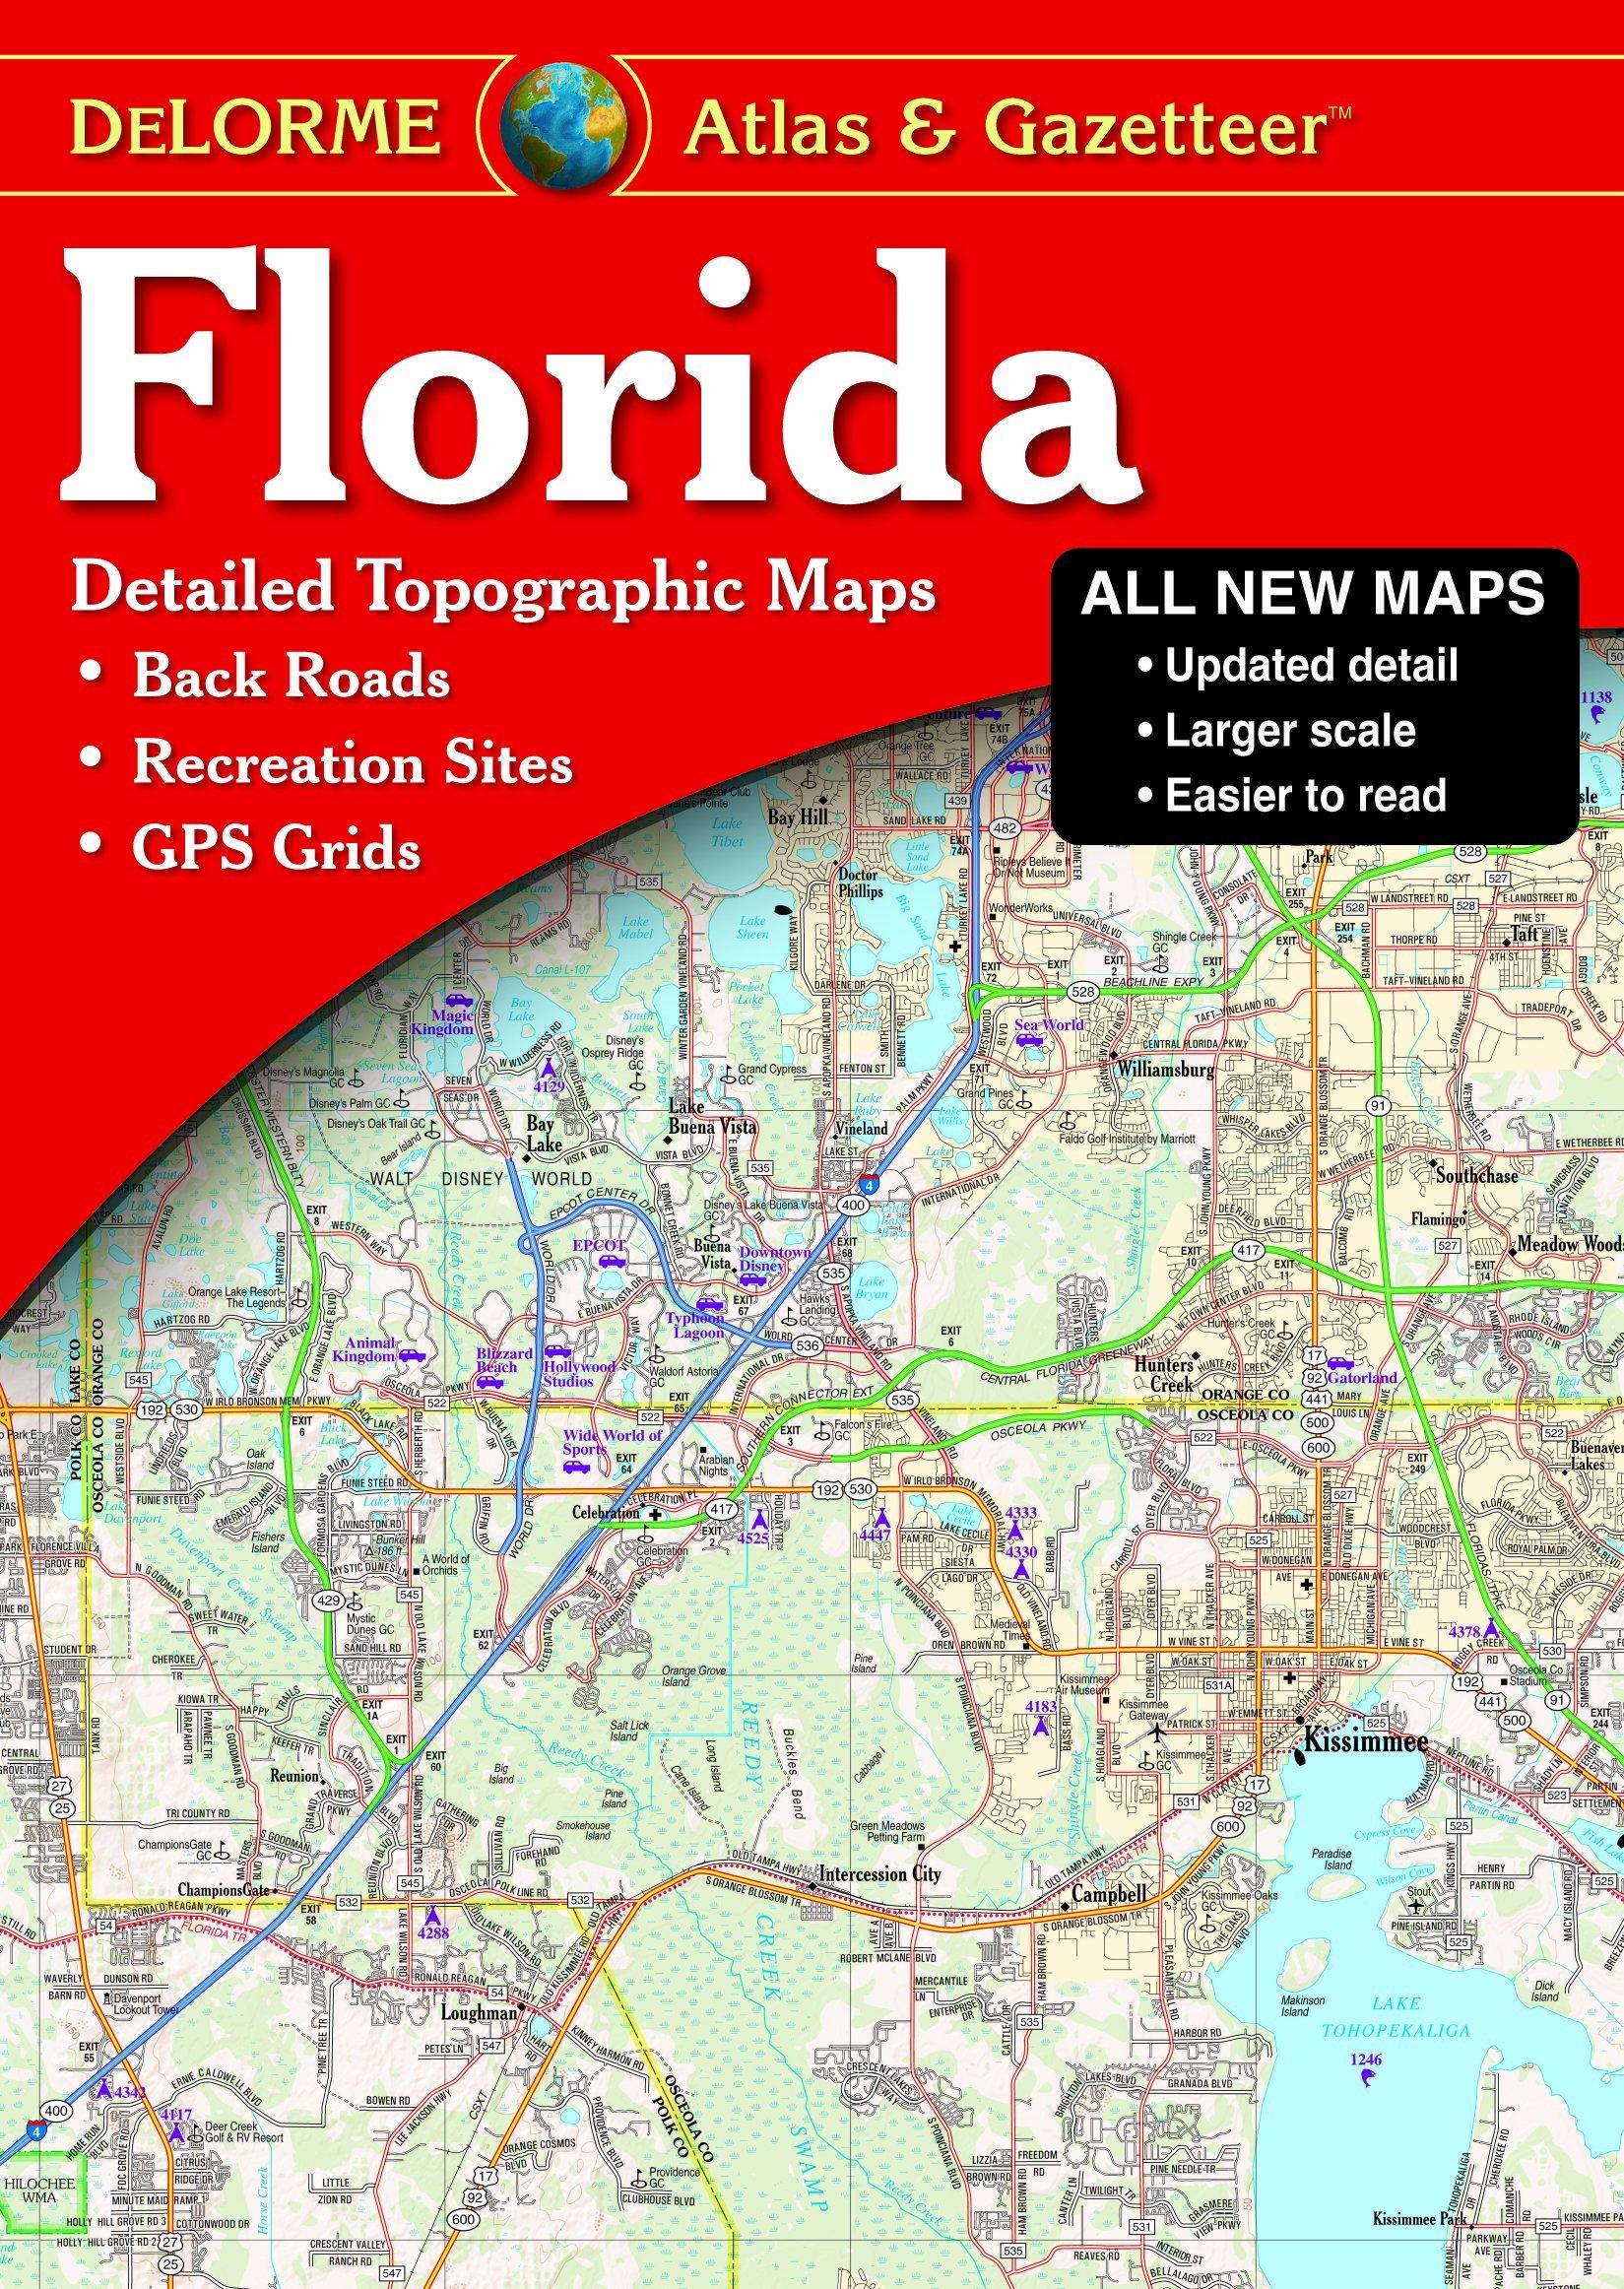 Map Of Florida Detailed.Florida Atlas Gazetteer Detailed Topographic Maps Back Roads